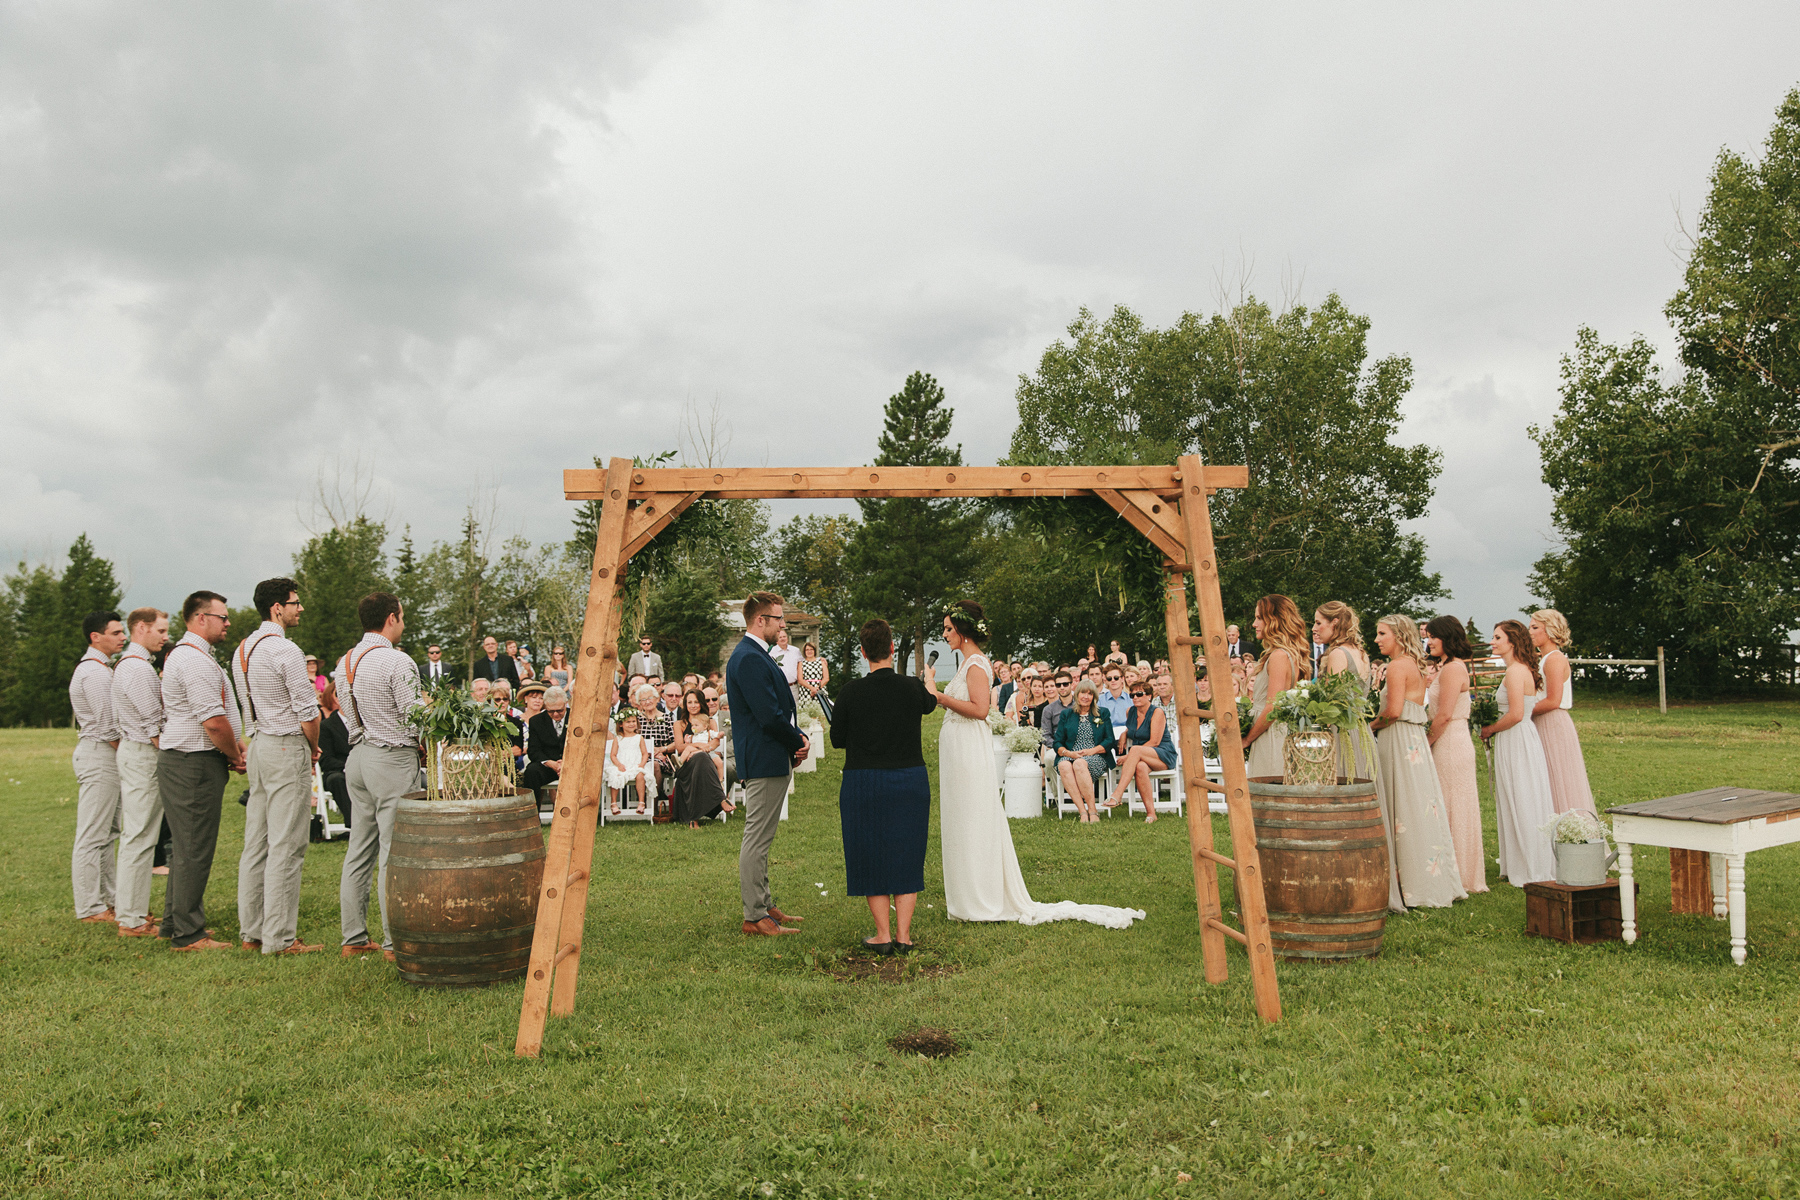 alberta-farm-wedding-photographer-rp-wj-136.jpg